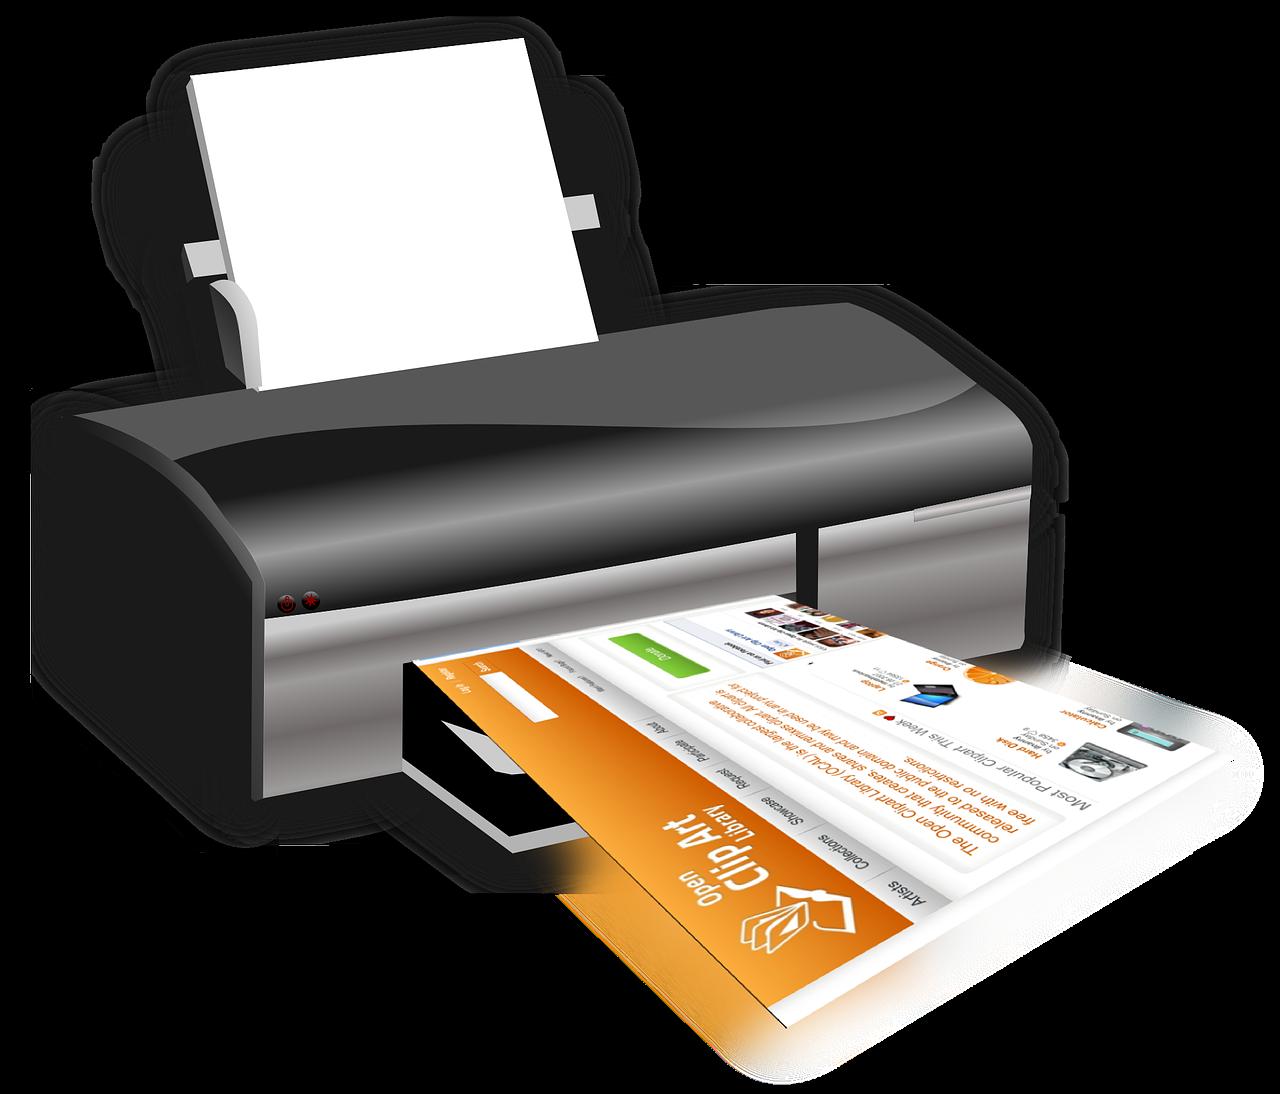 Konfiguracja drukarki dla polecenia PLOT